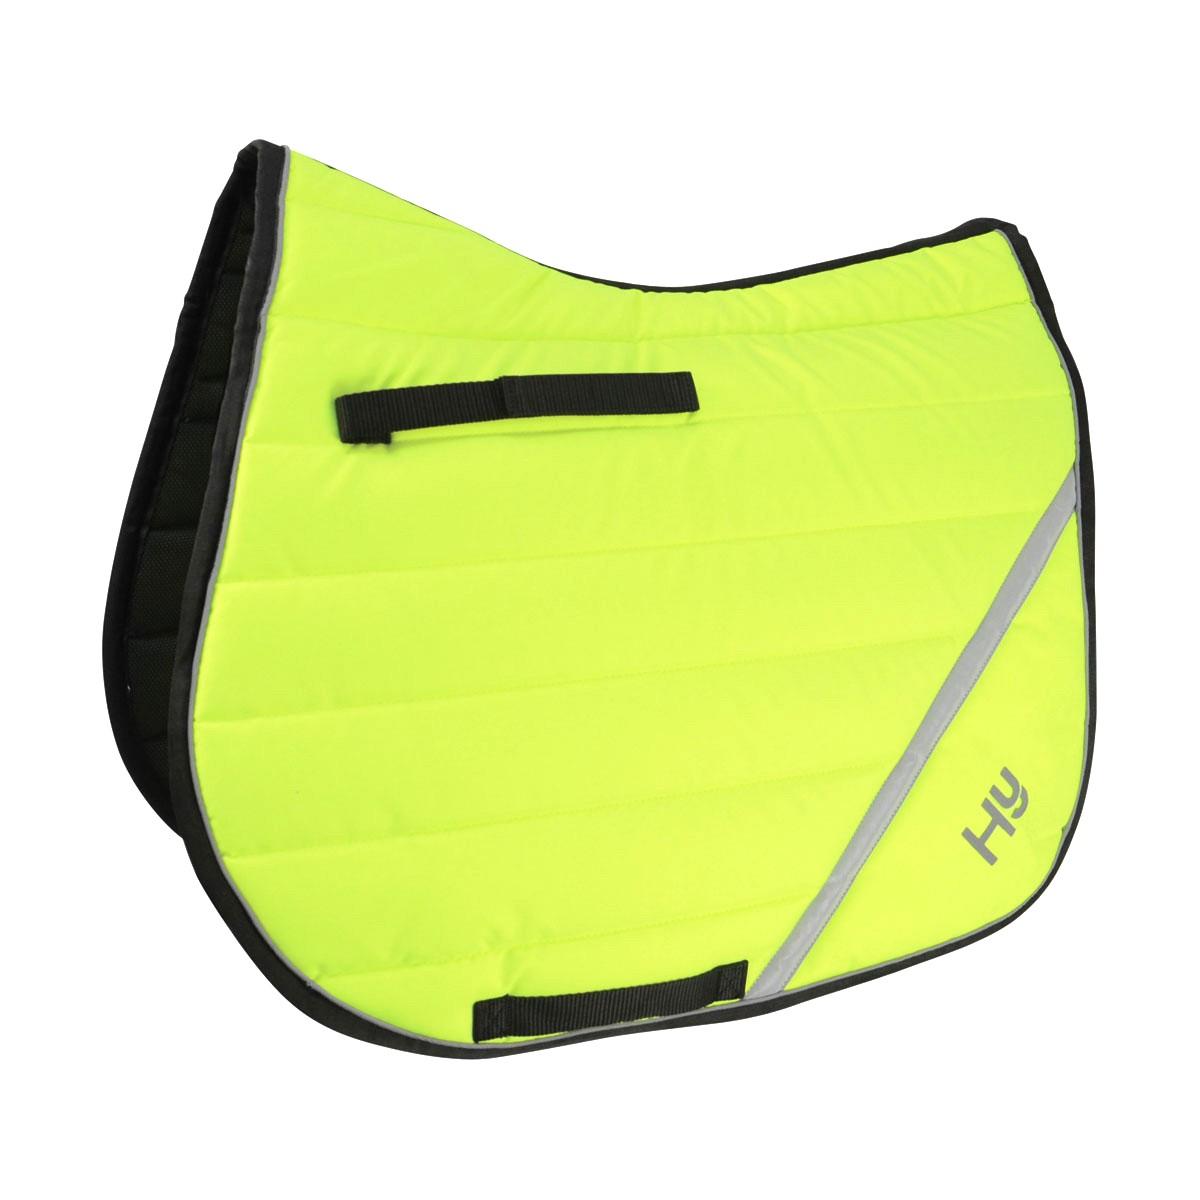 HyVIZ Reflector Comfort Saddle Pad